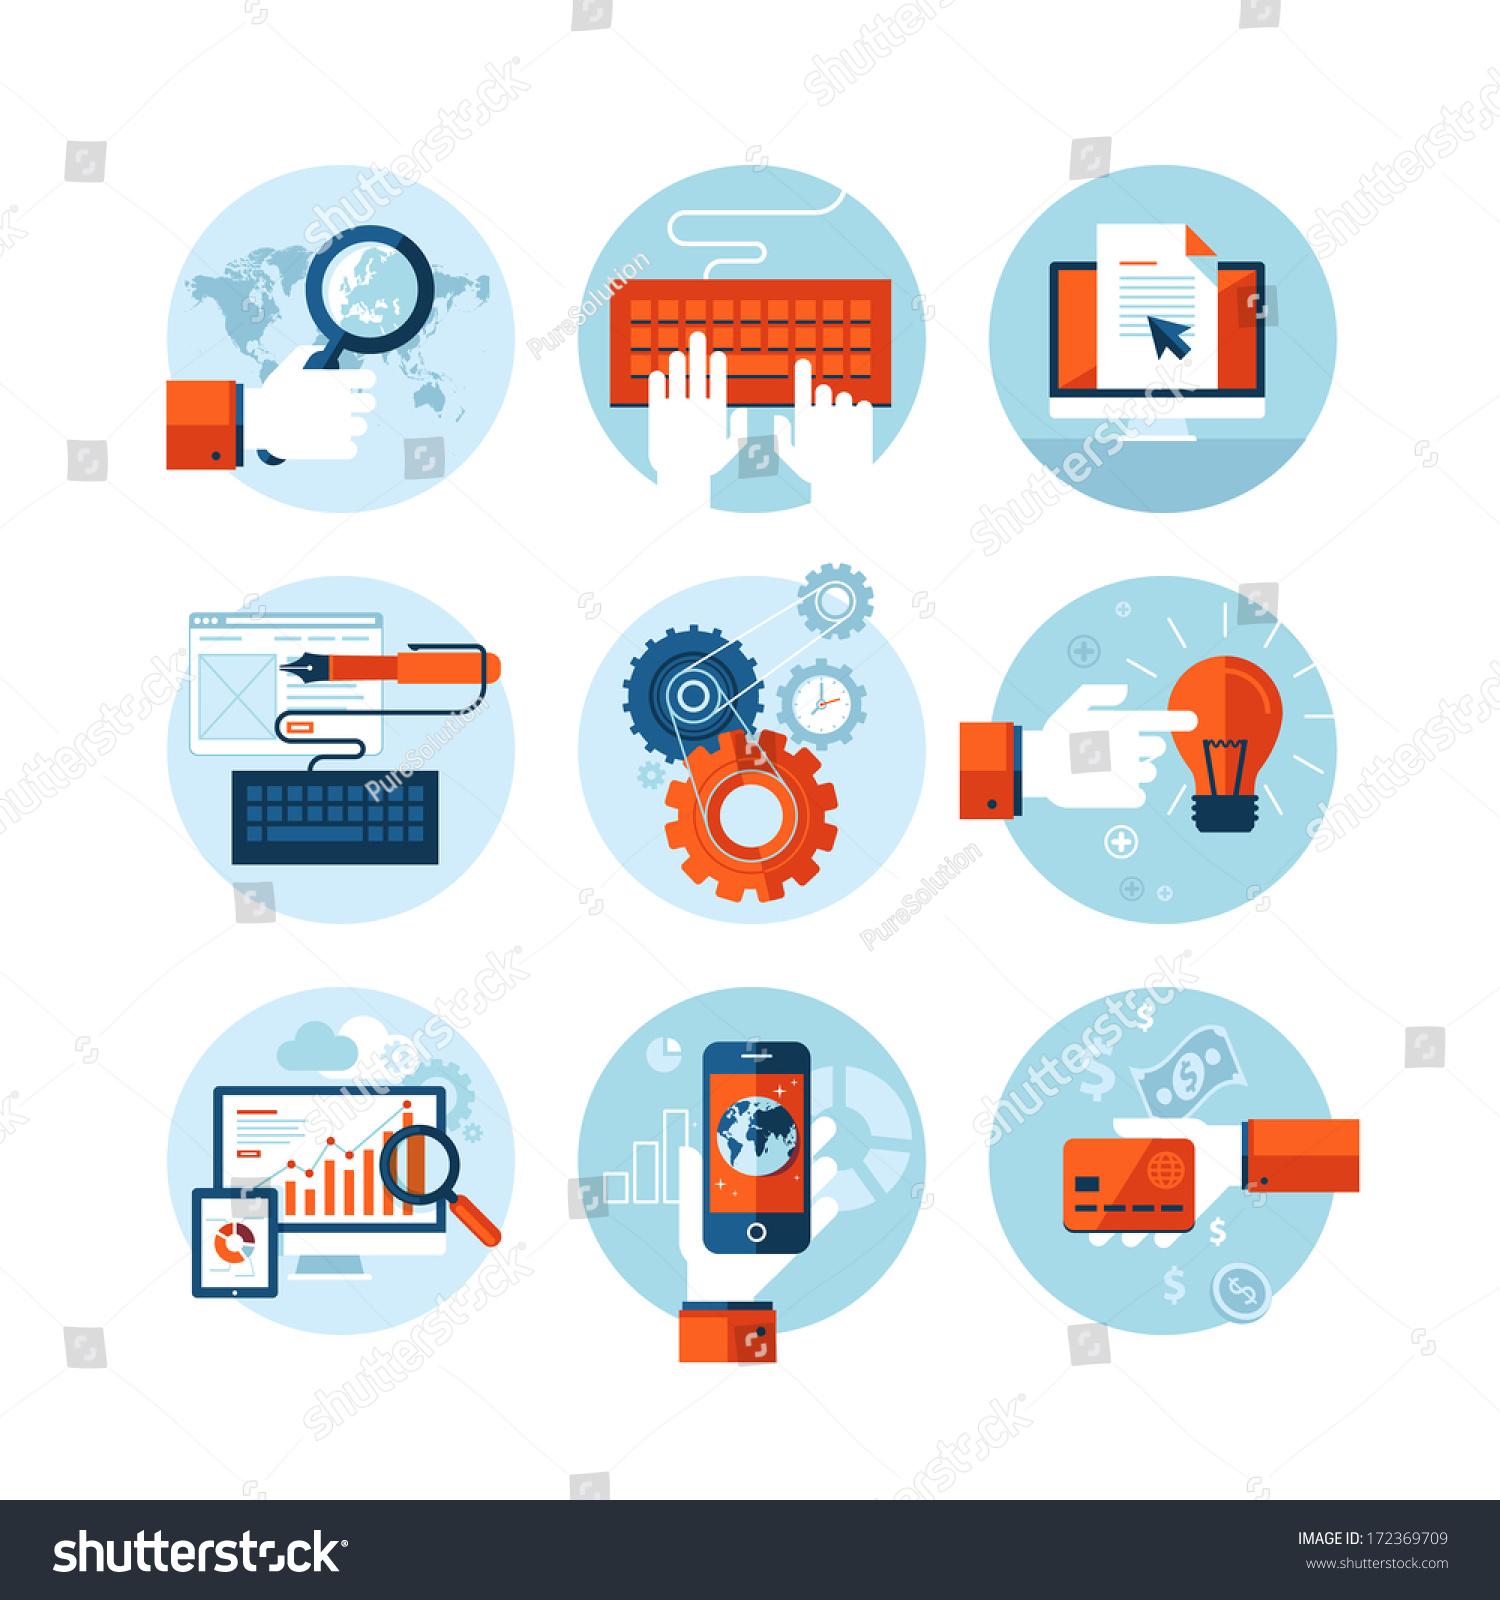 Set Modern Flat Design Icons On Stock Vector 172369709 - Shutterstock